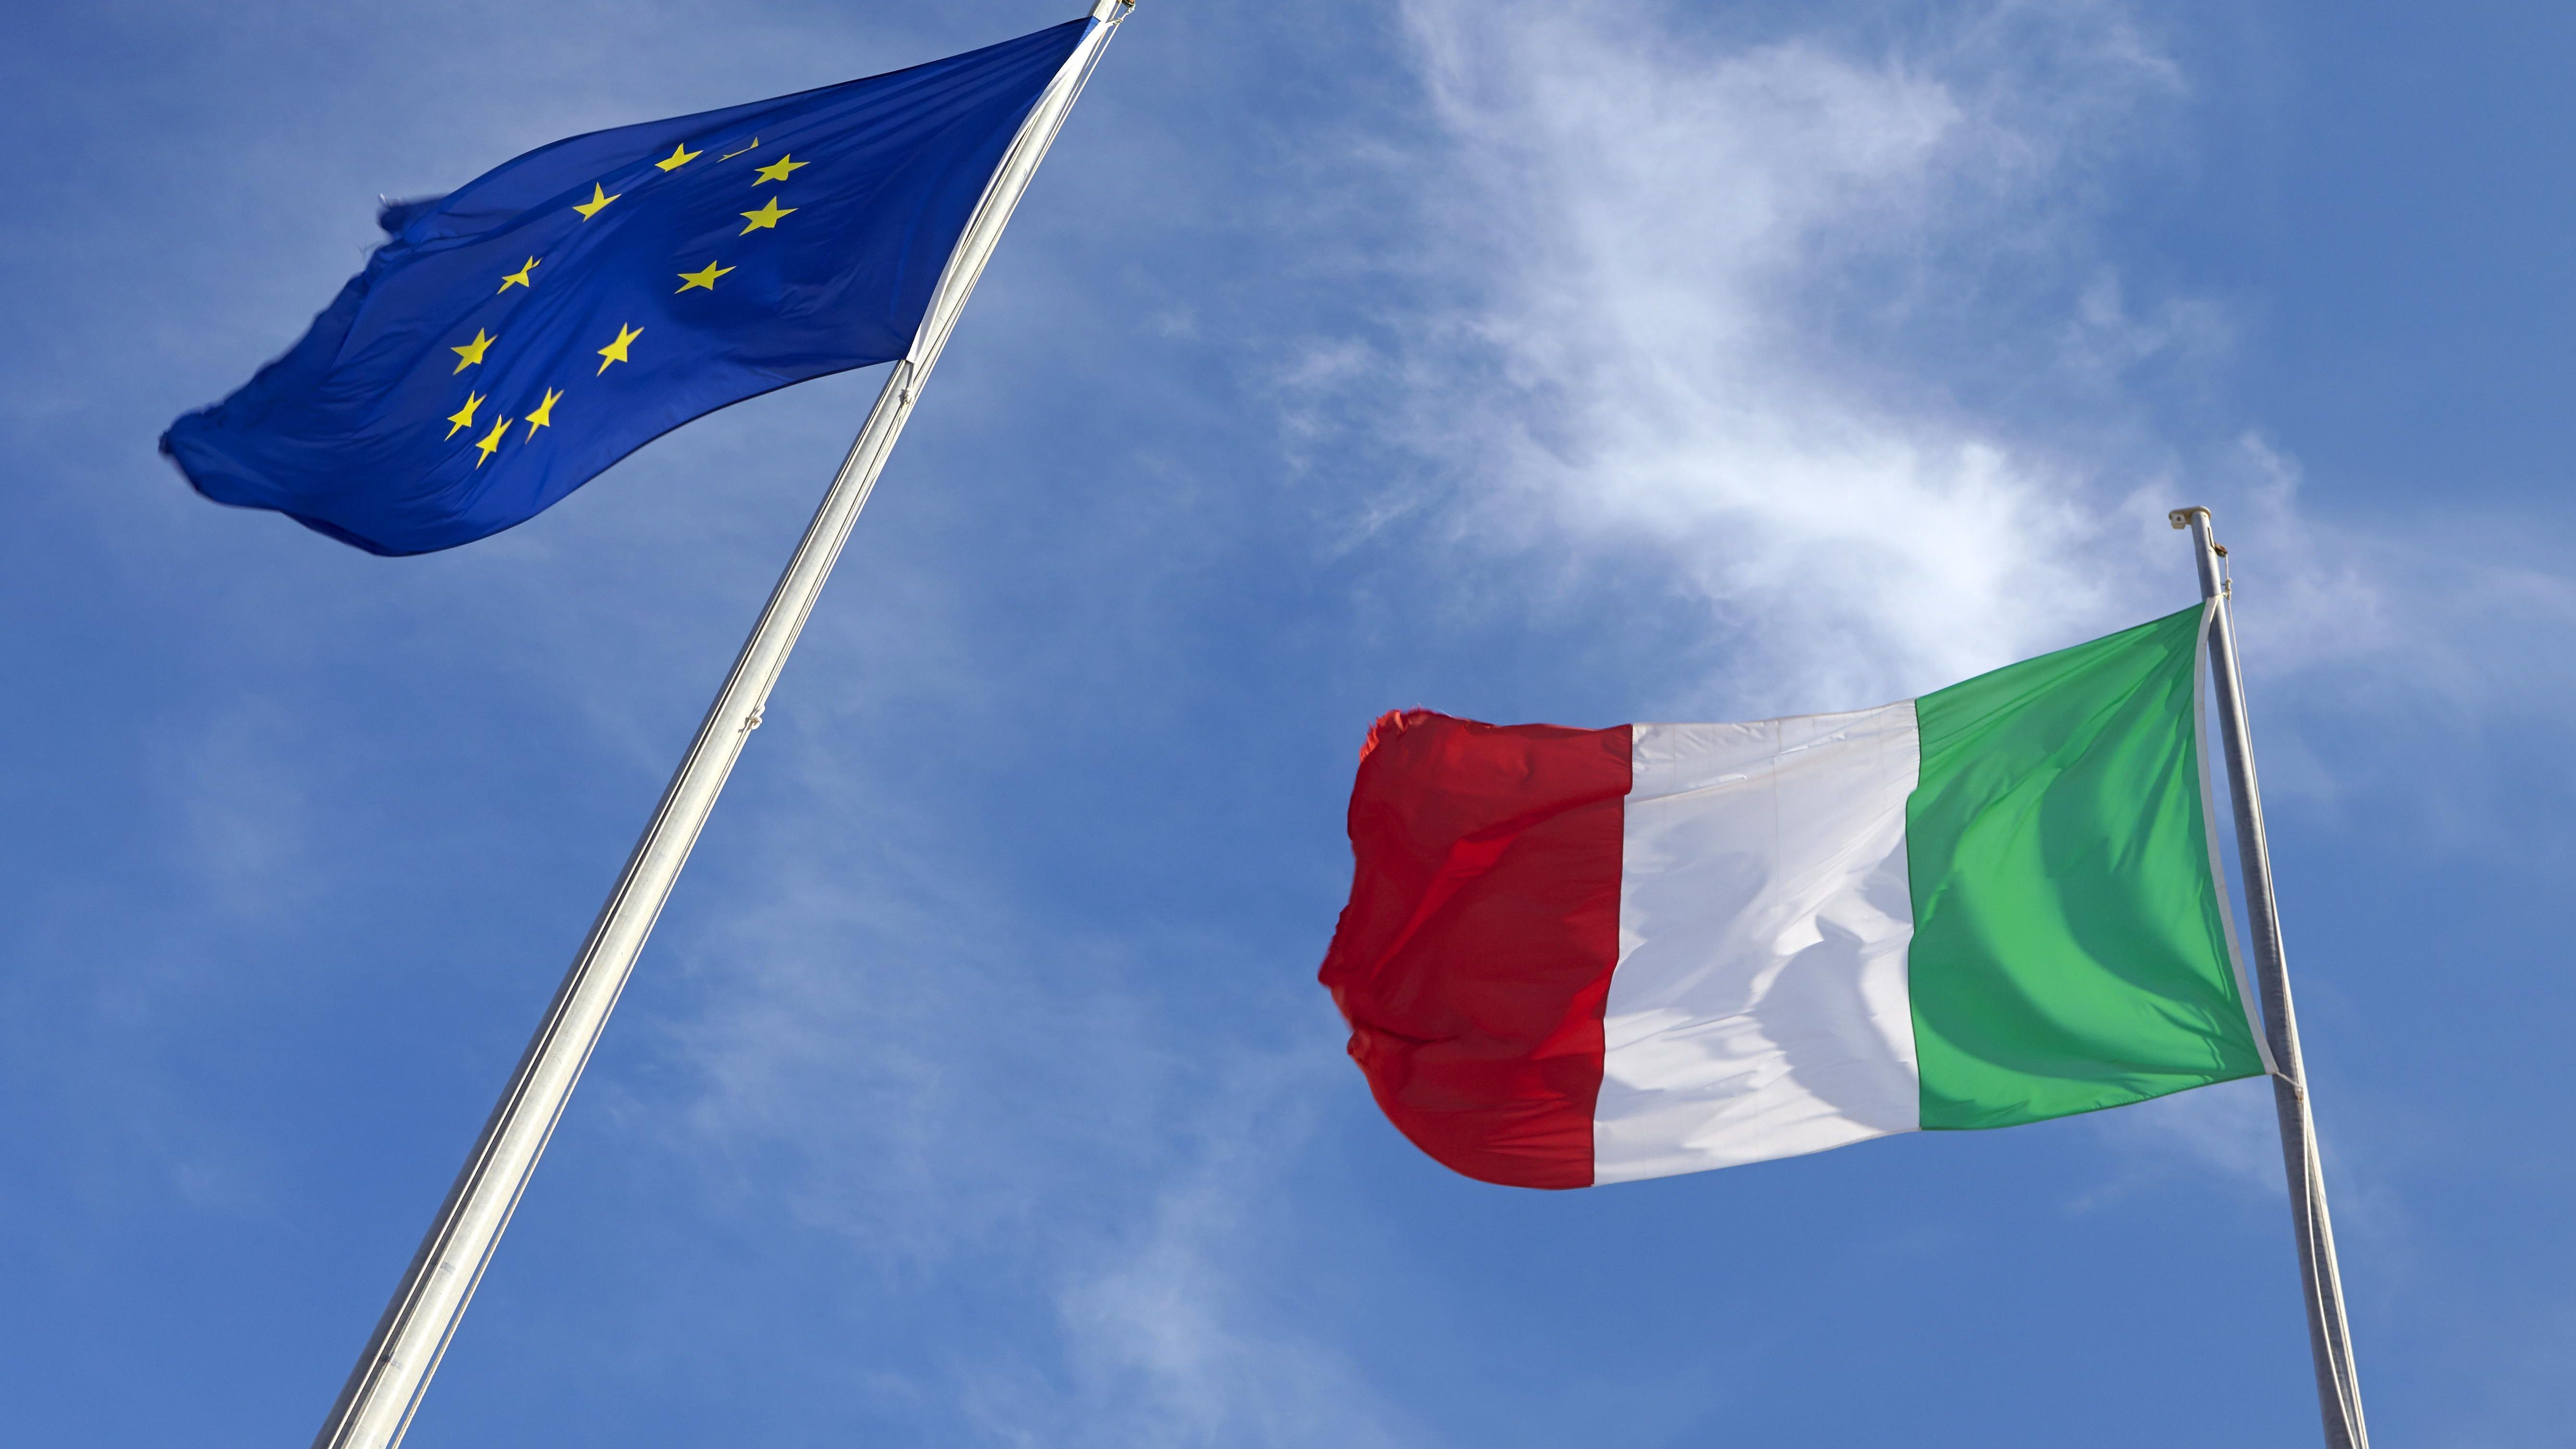 EU-Flagge neben der italienischen Flagge